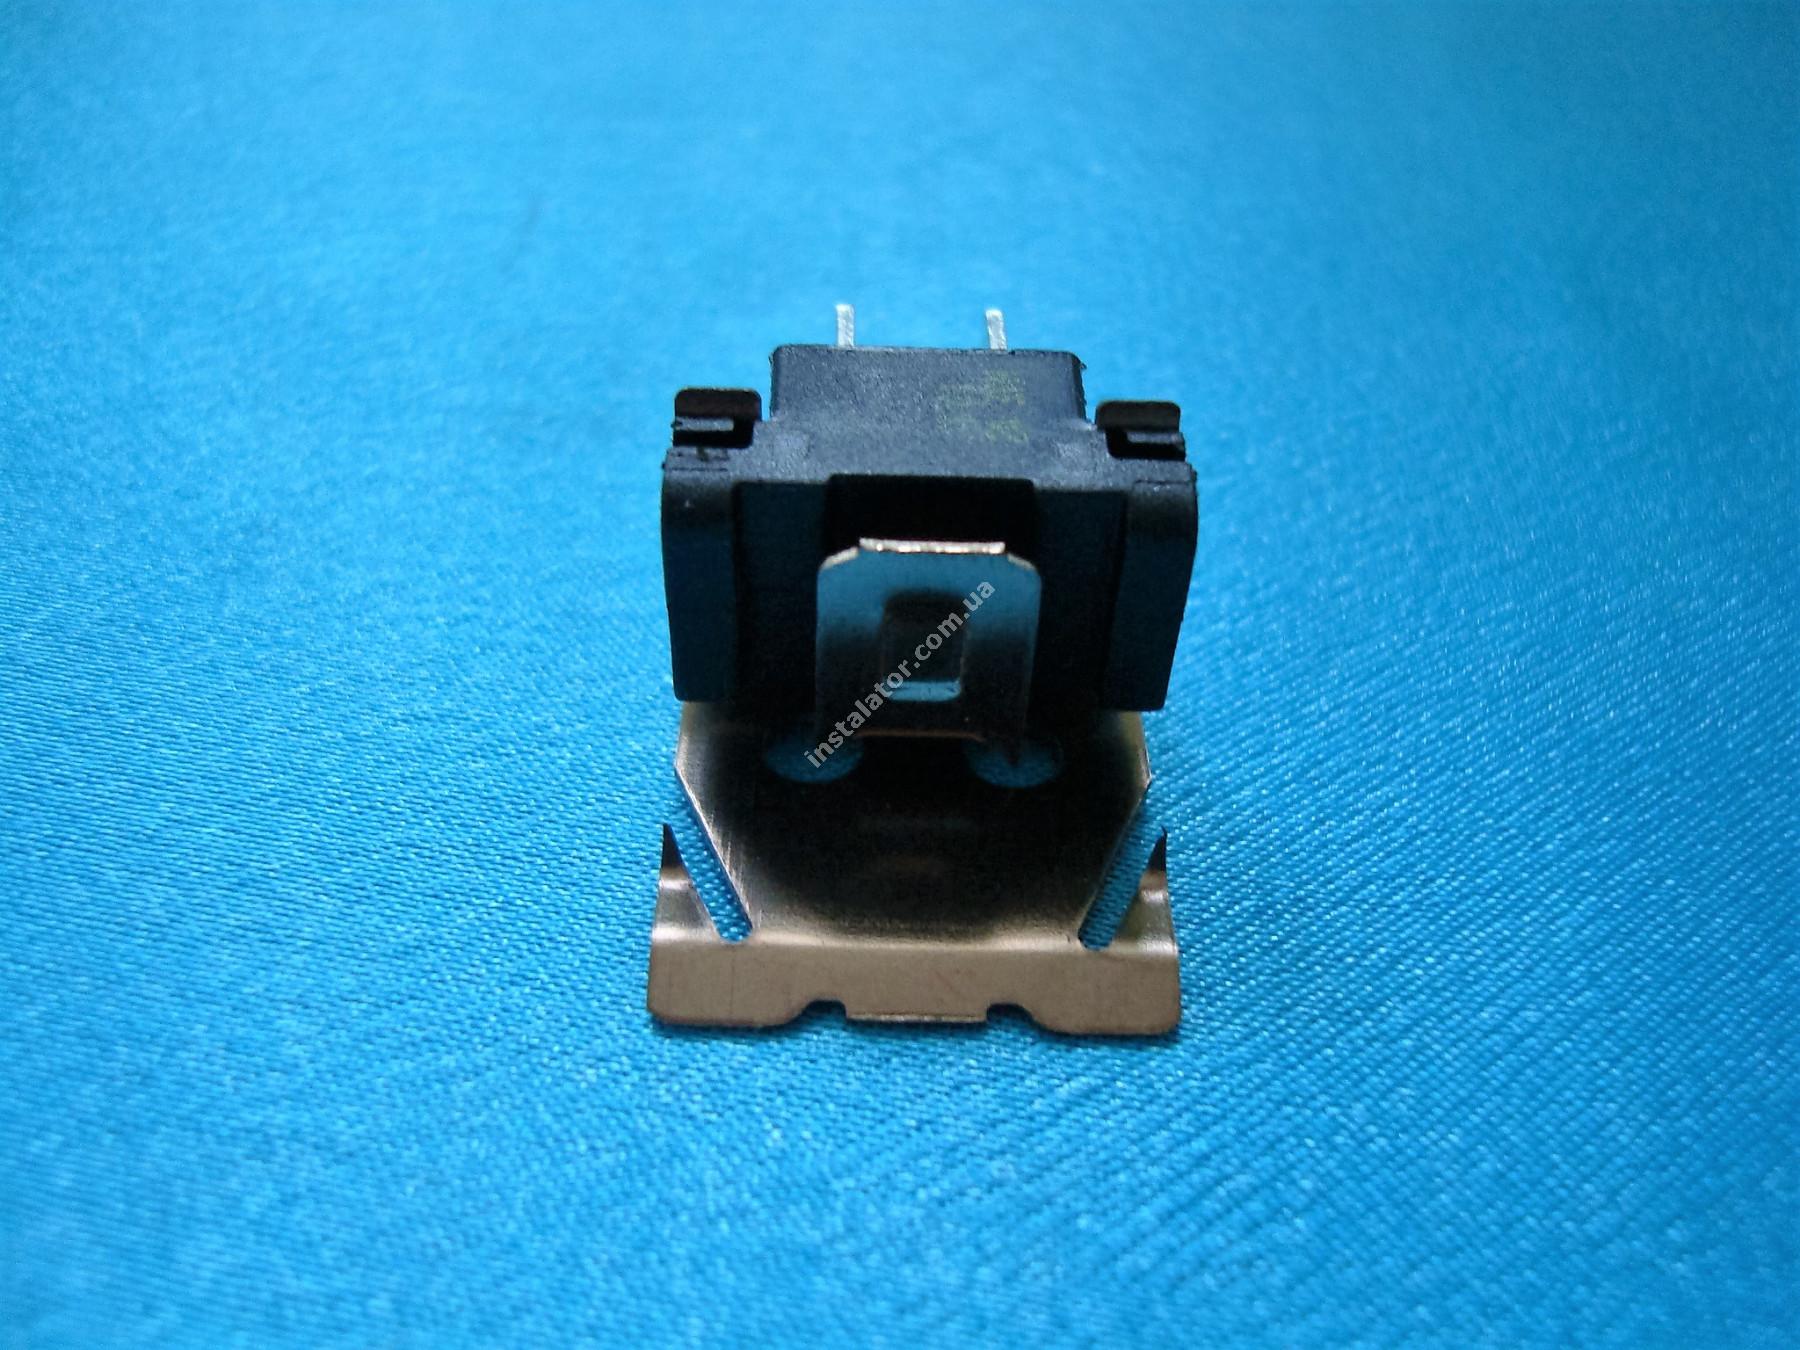 103430 Датчик температури  (зонд NTC) Vaillant turboTEC, atmoTEC, ecoTEC full-image-2